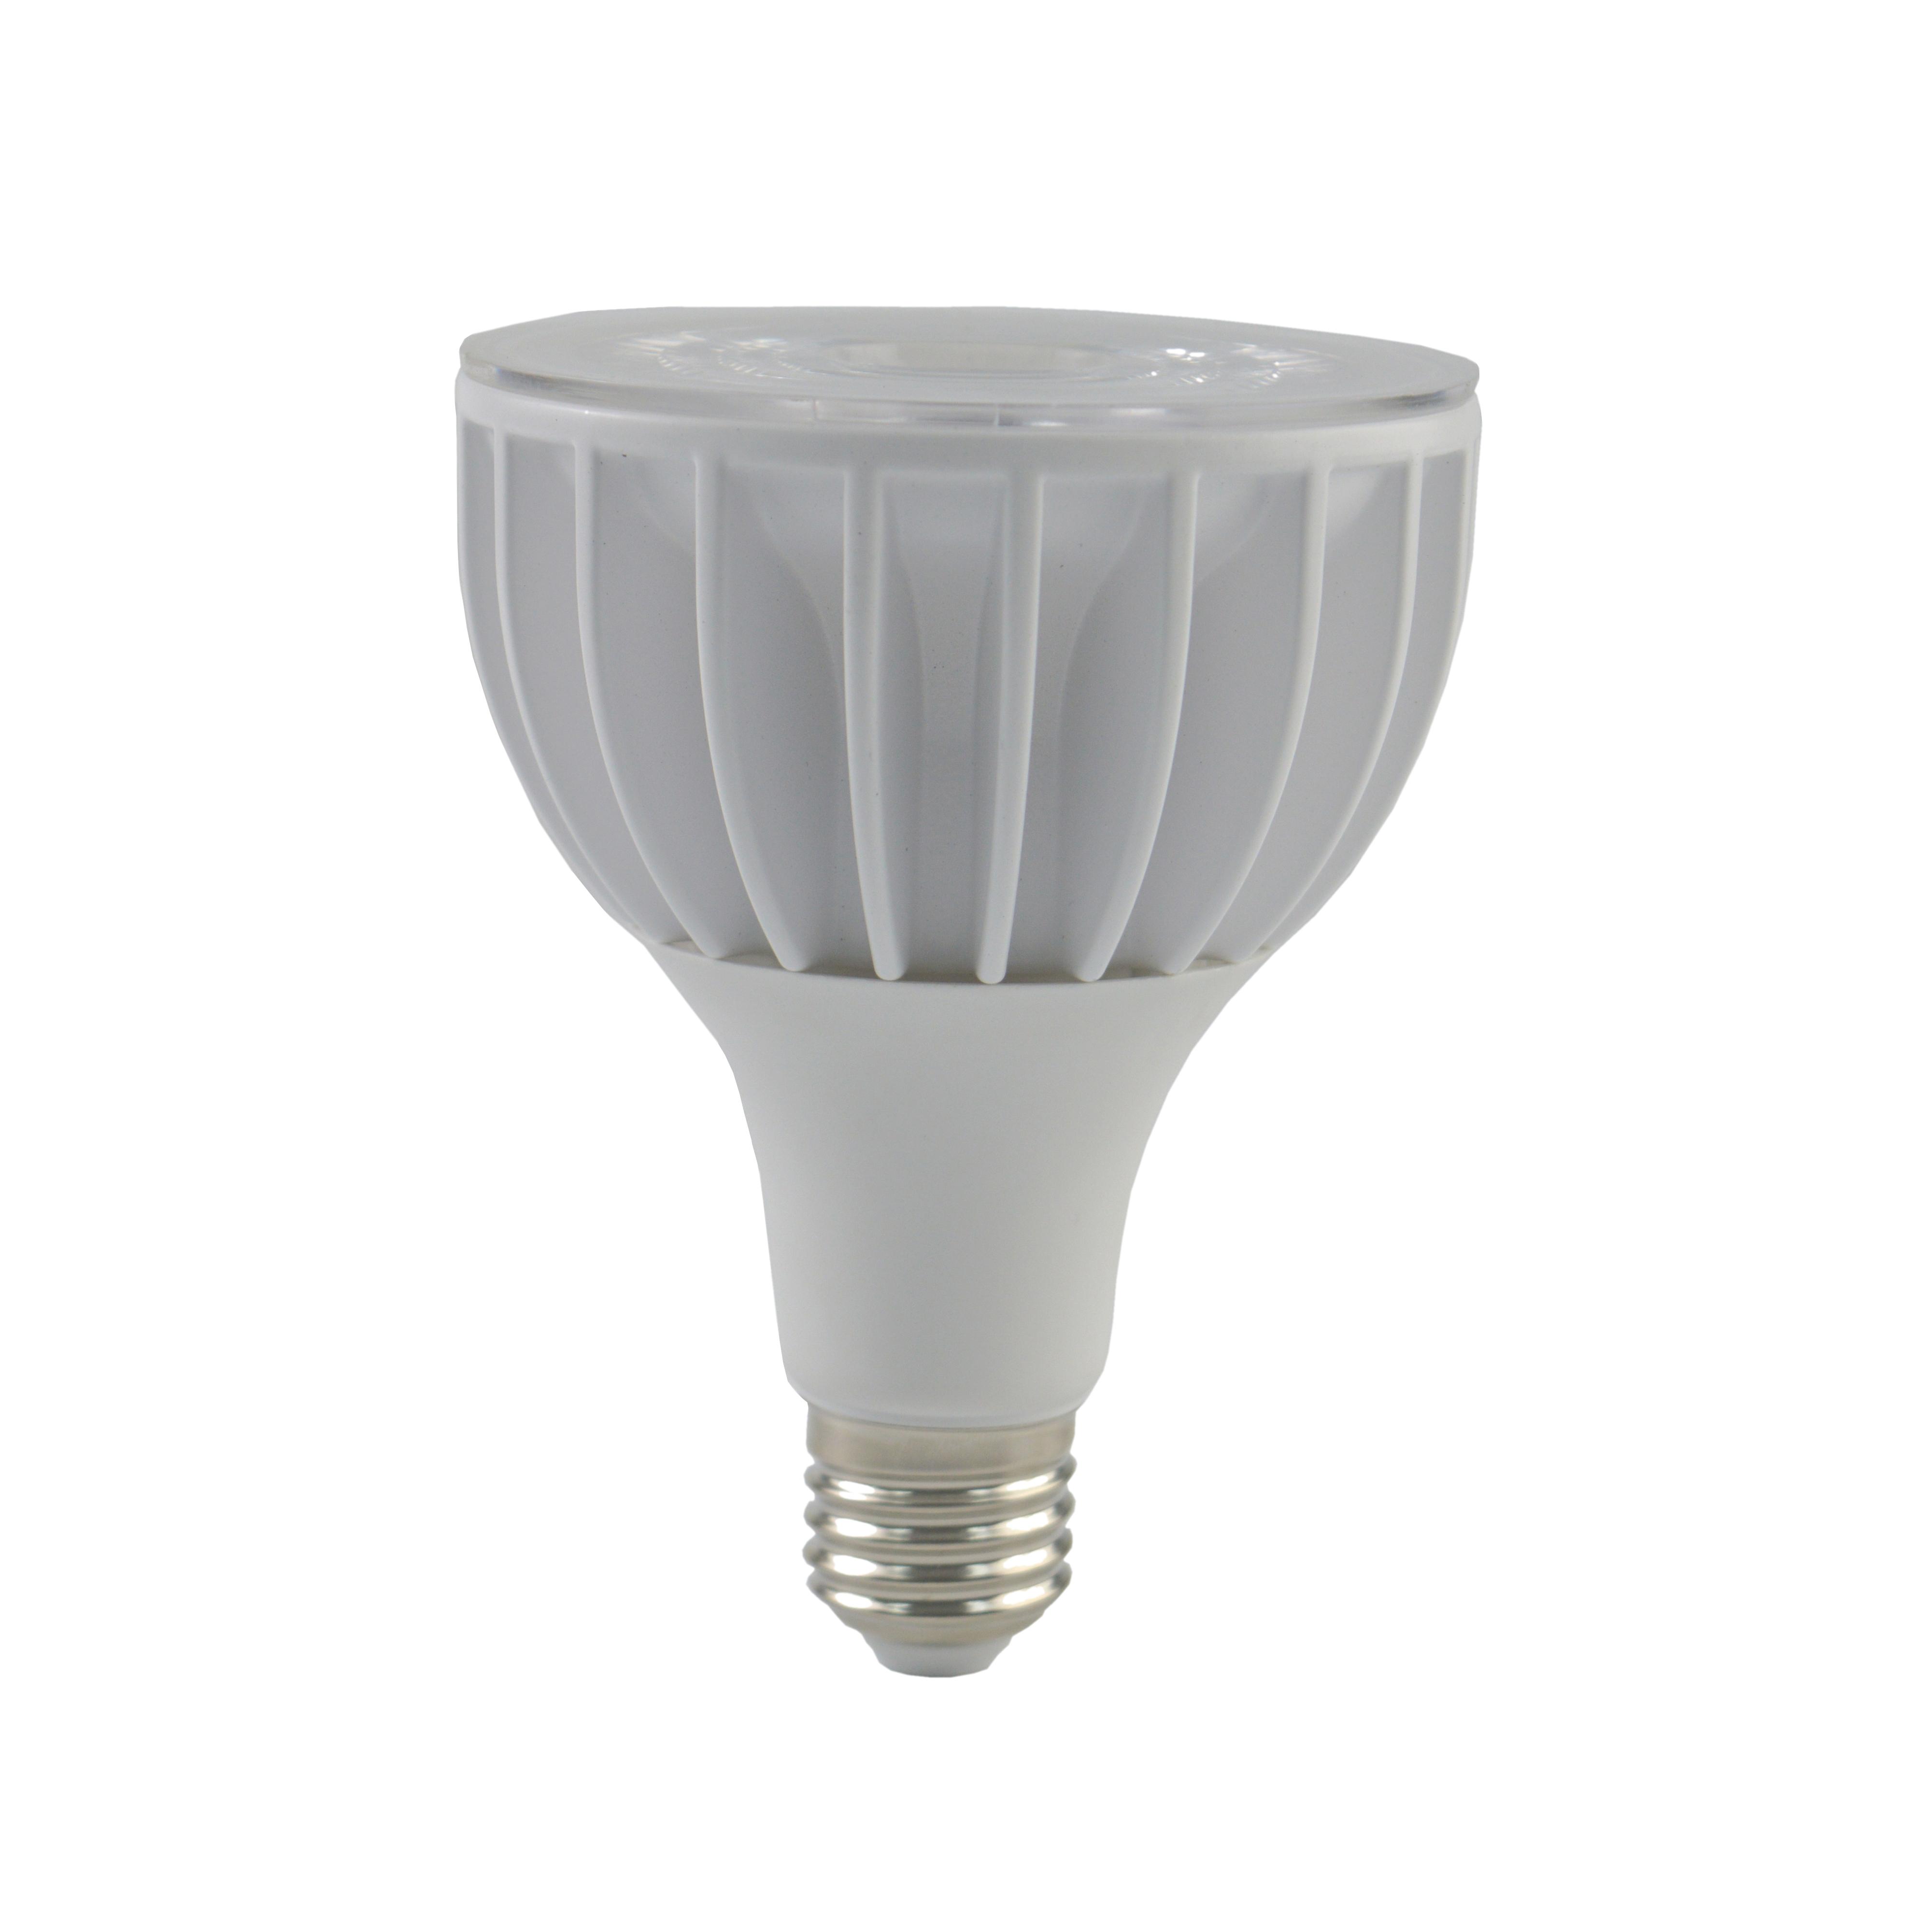 PAR20 PAR30 PAR38 E26 E27 LED 110V-240V 15W Dimmable LED Ceiling Lamp Spot Lights Bulb